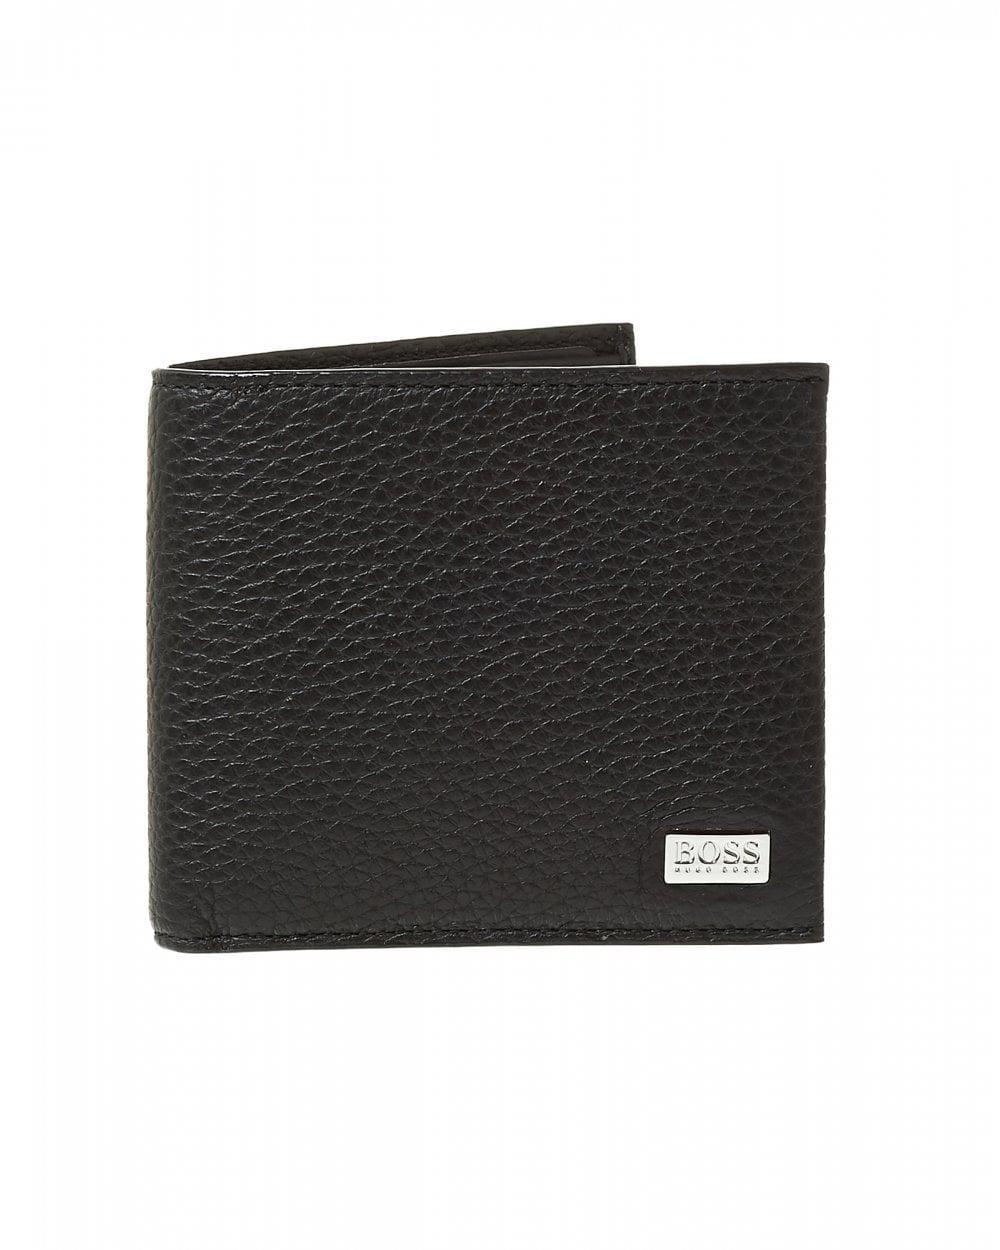 4bc9d9ff5f4 Lyst - BOSS Crosstown Black Leather Billfold Wallet in Black for Men